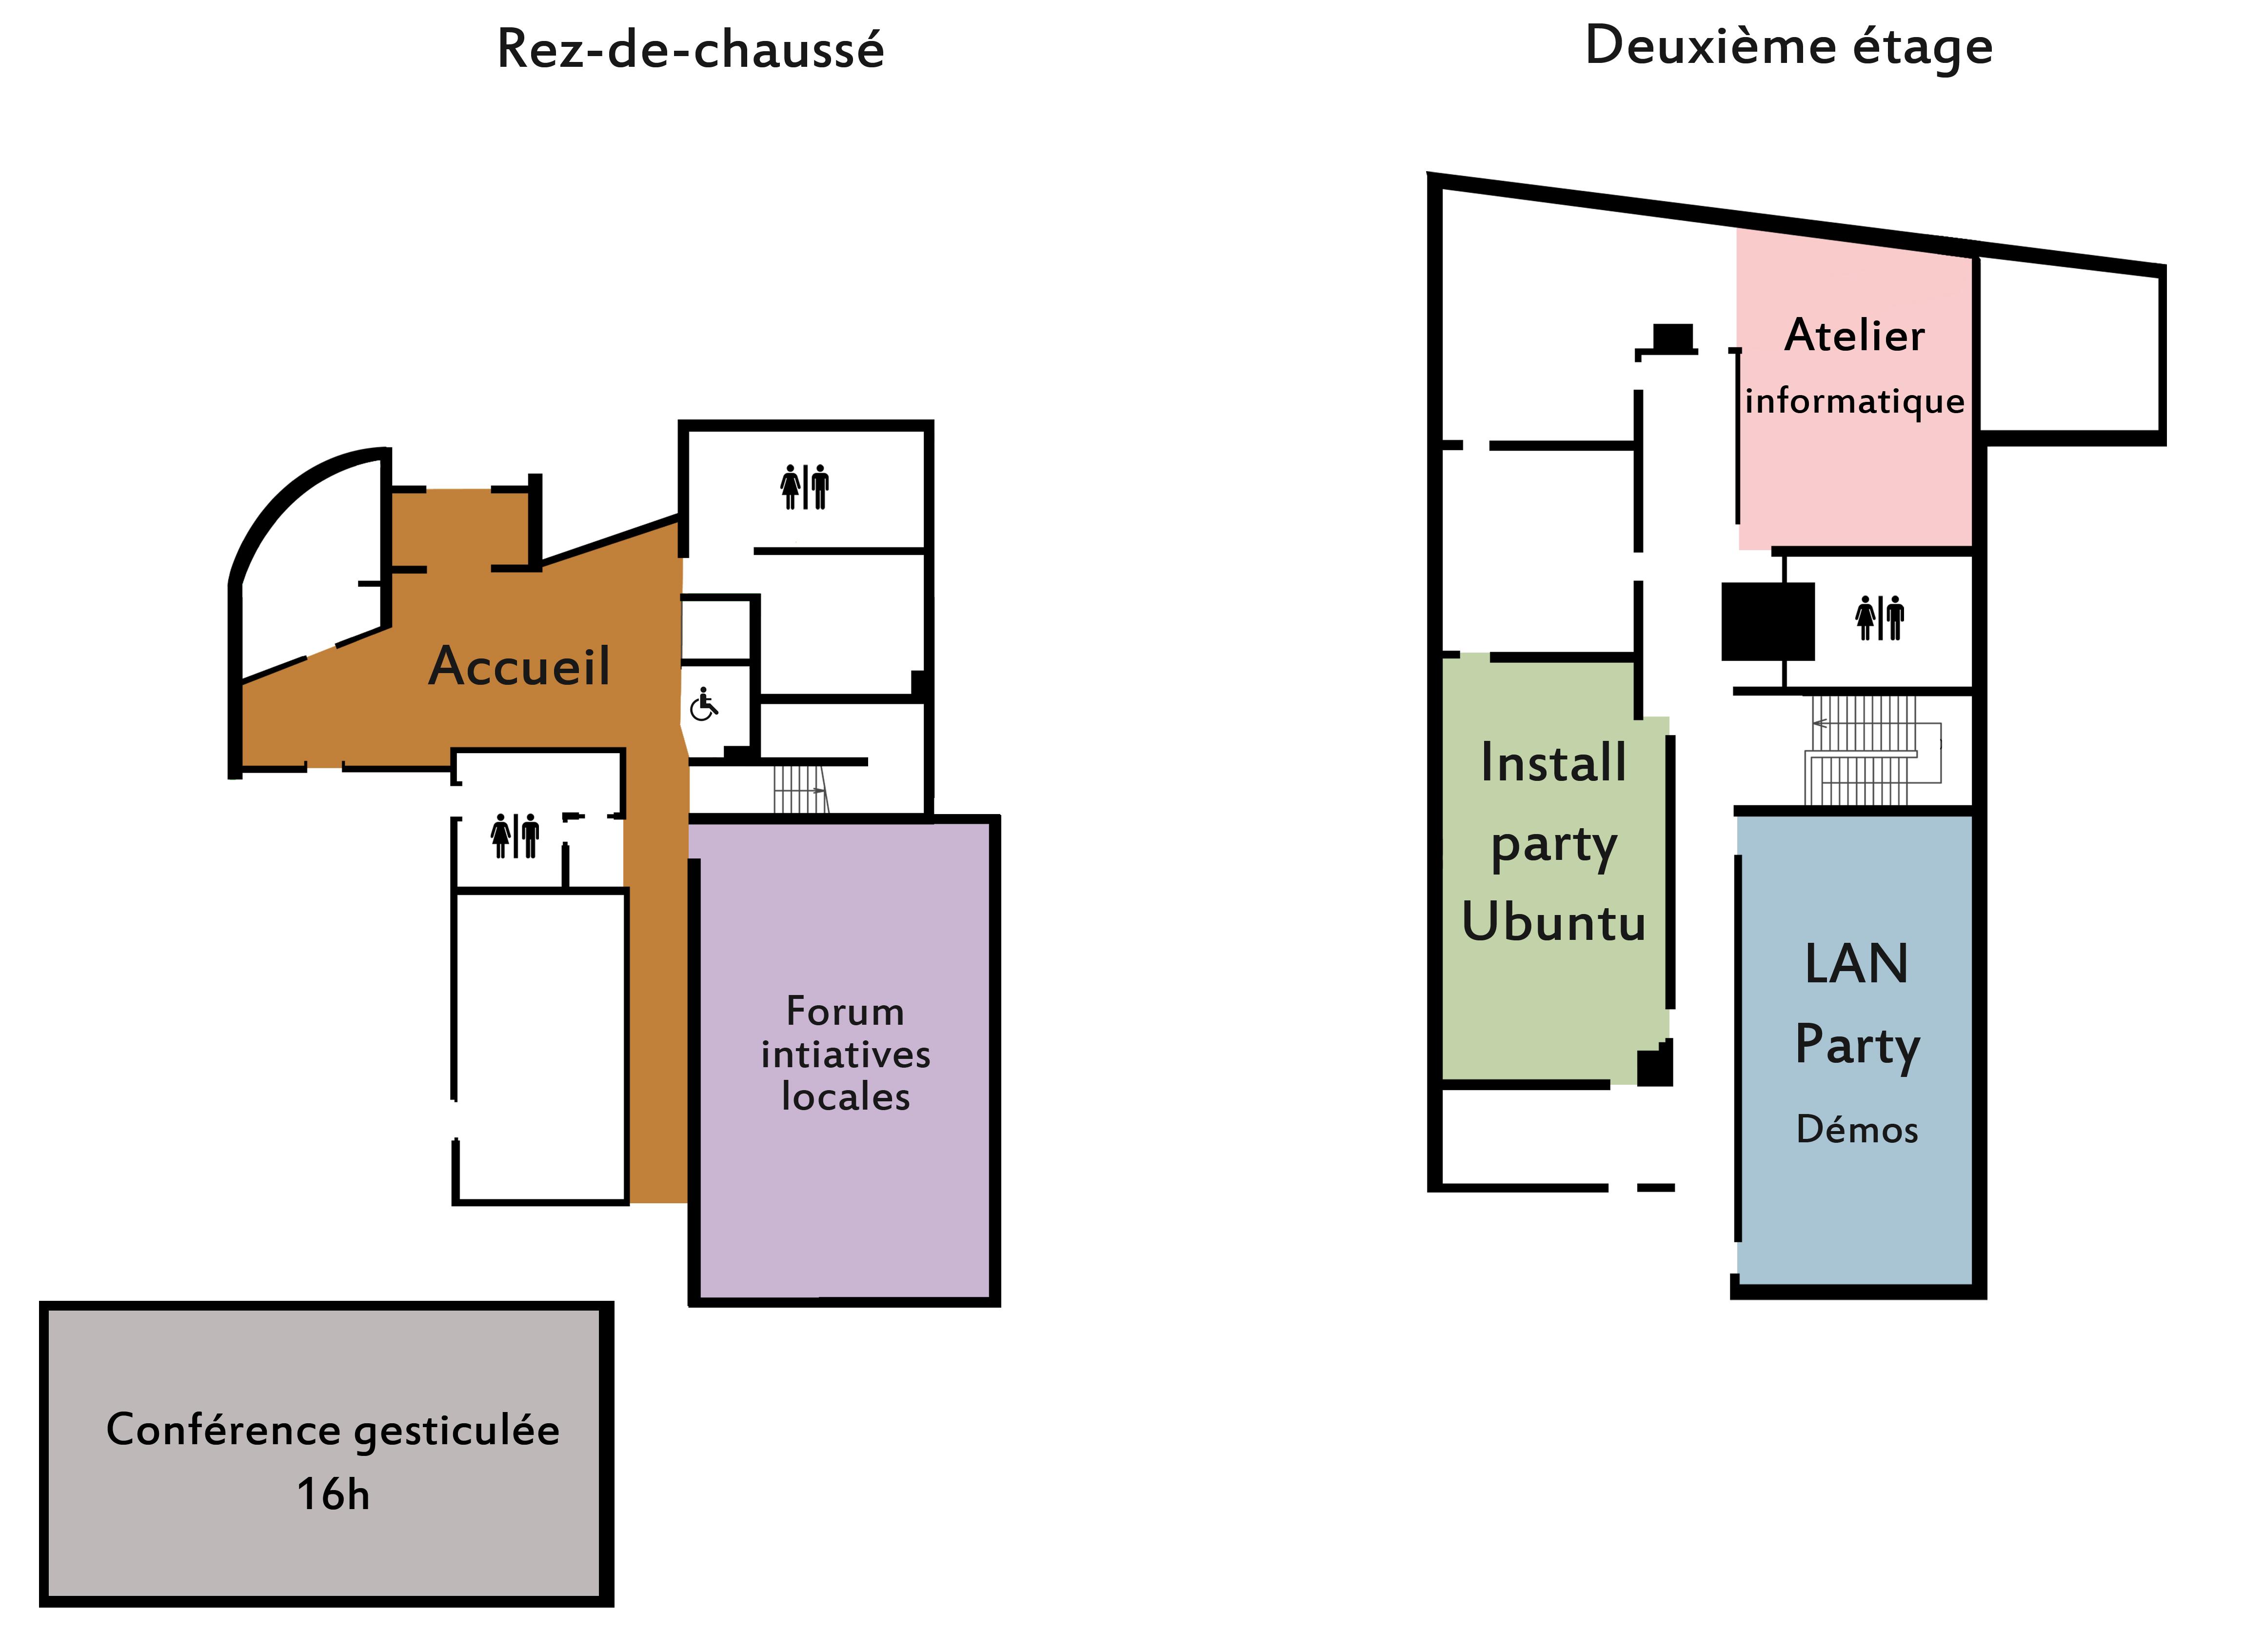 Allplan: 50 49 - L' HYROME - Chemillé